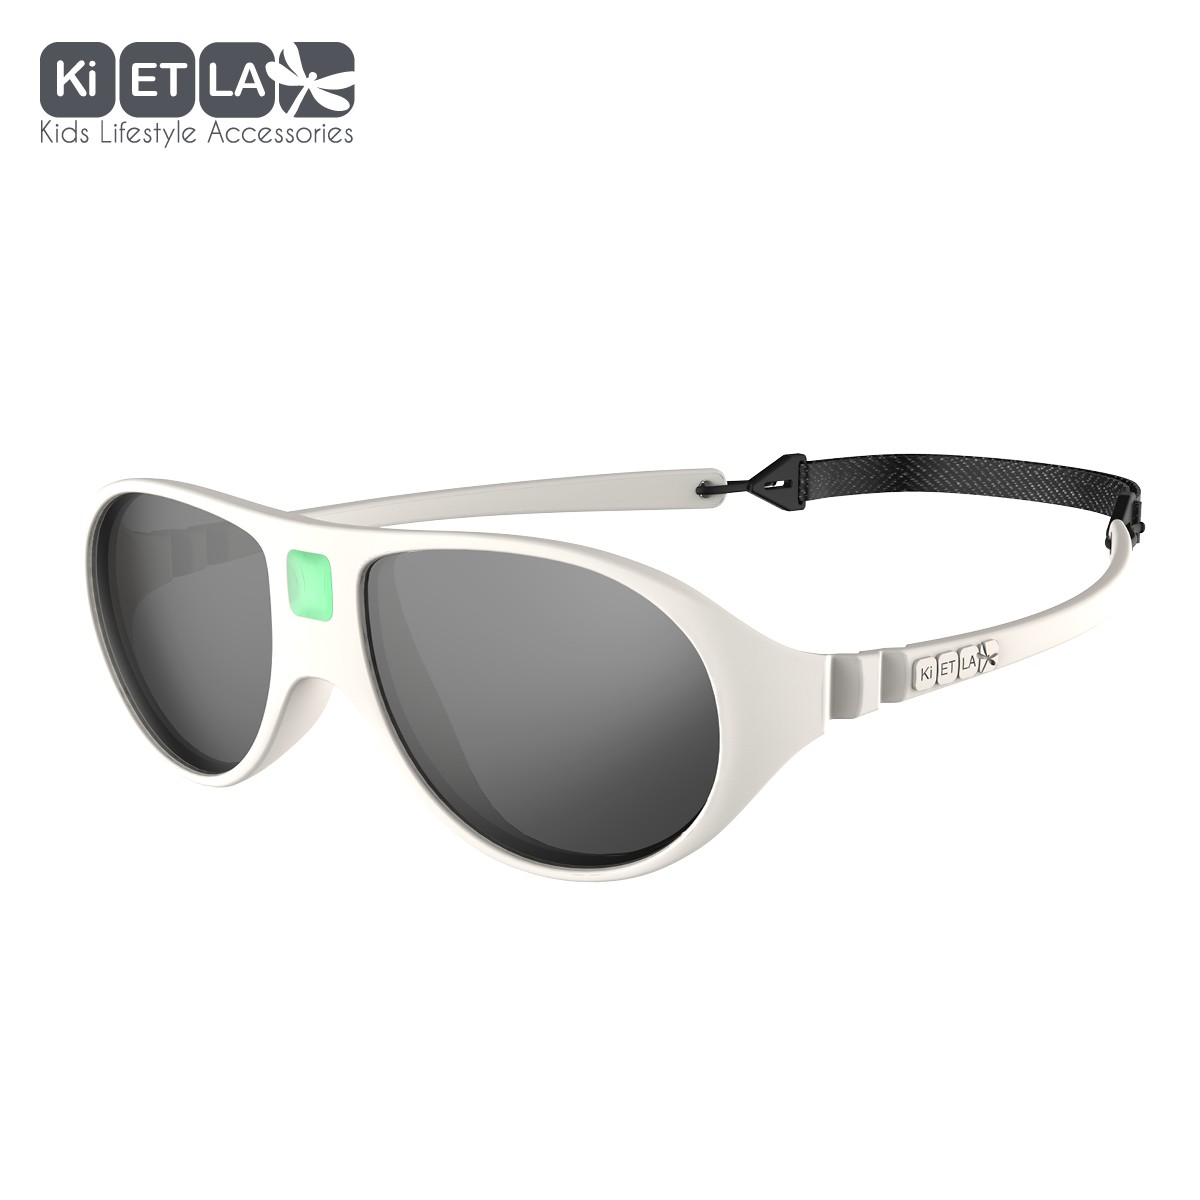 ee690023bf4ee3 Ki Et La - UV-zonnebril voor peuters - Jokala - Crème - Sennes.nl